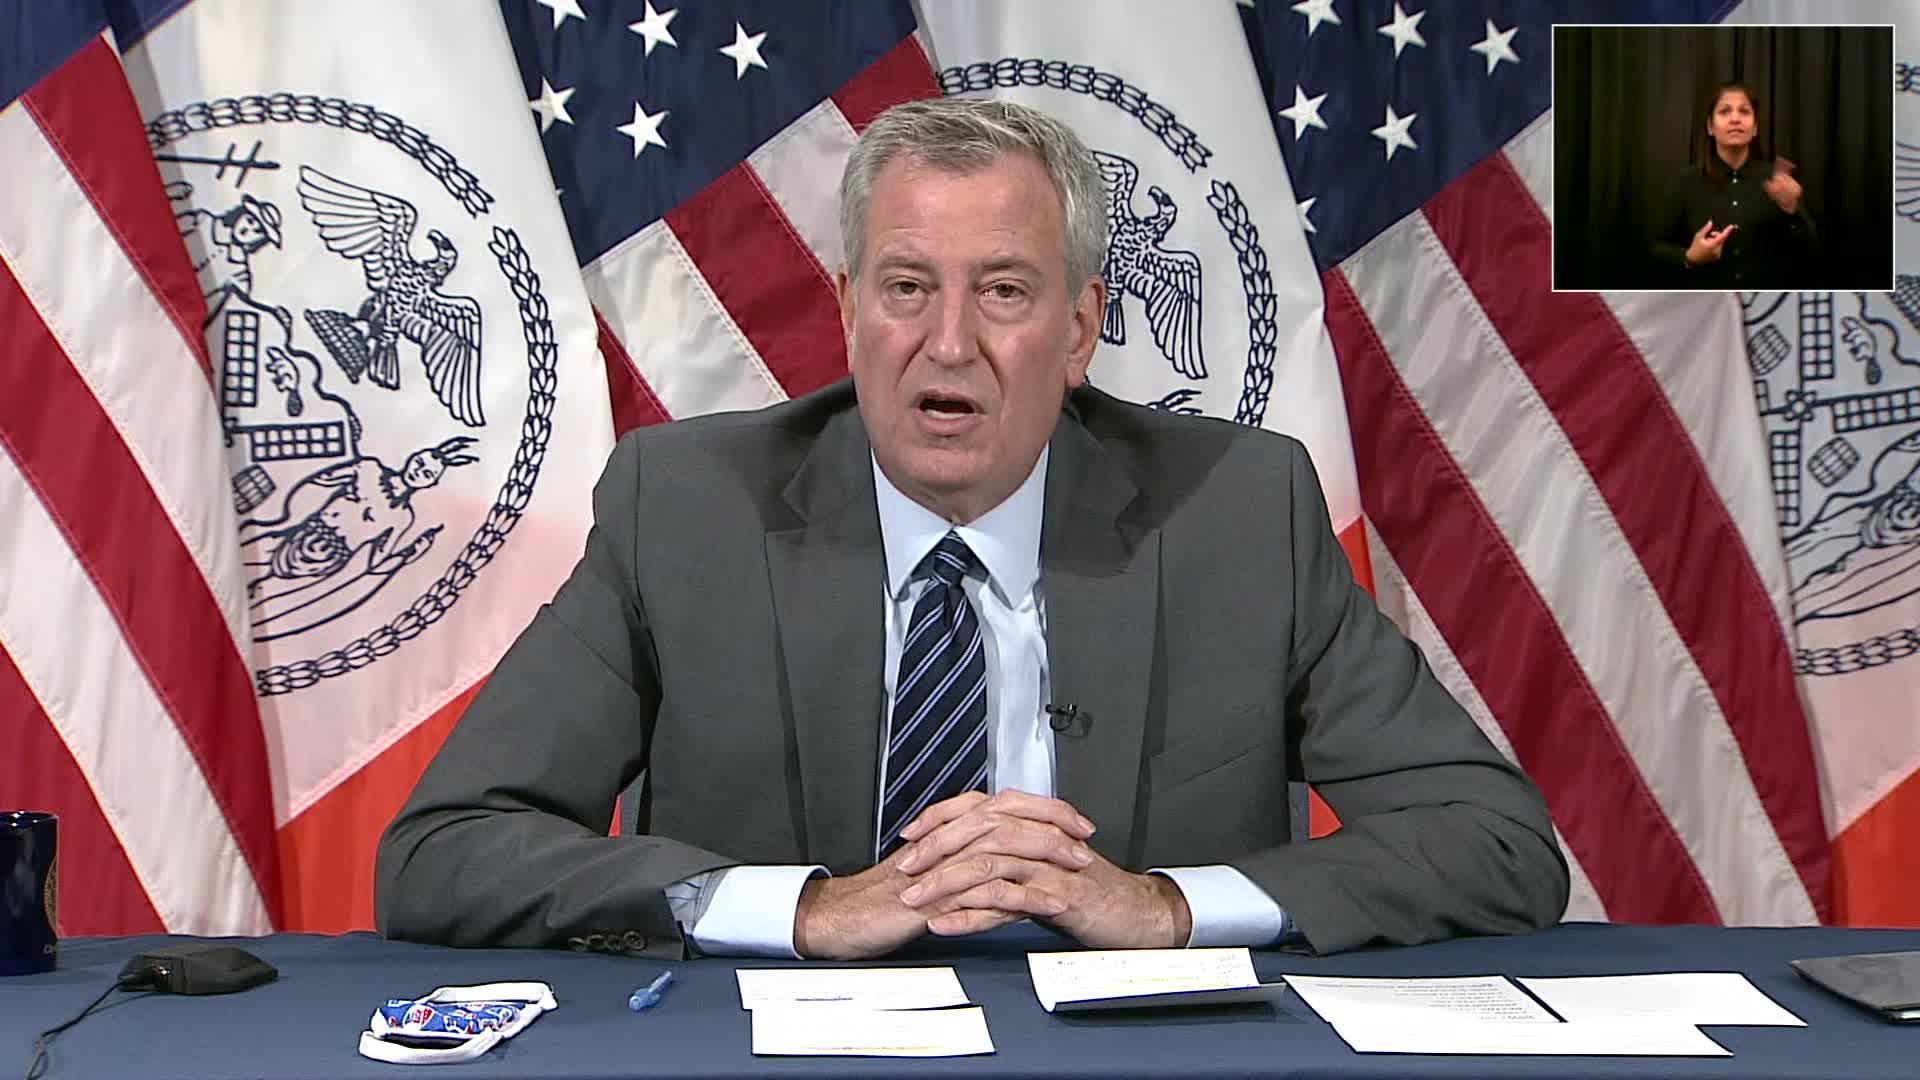 New York City Mayor Bill de Blasio speaks during a press briefing in New York City on November 10.